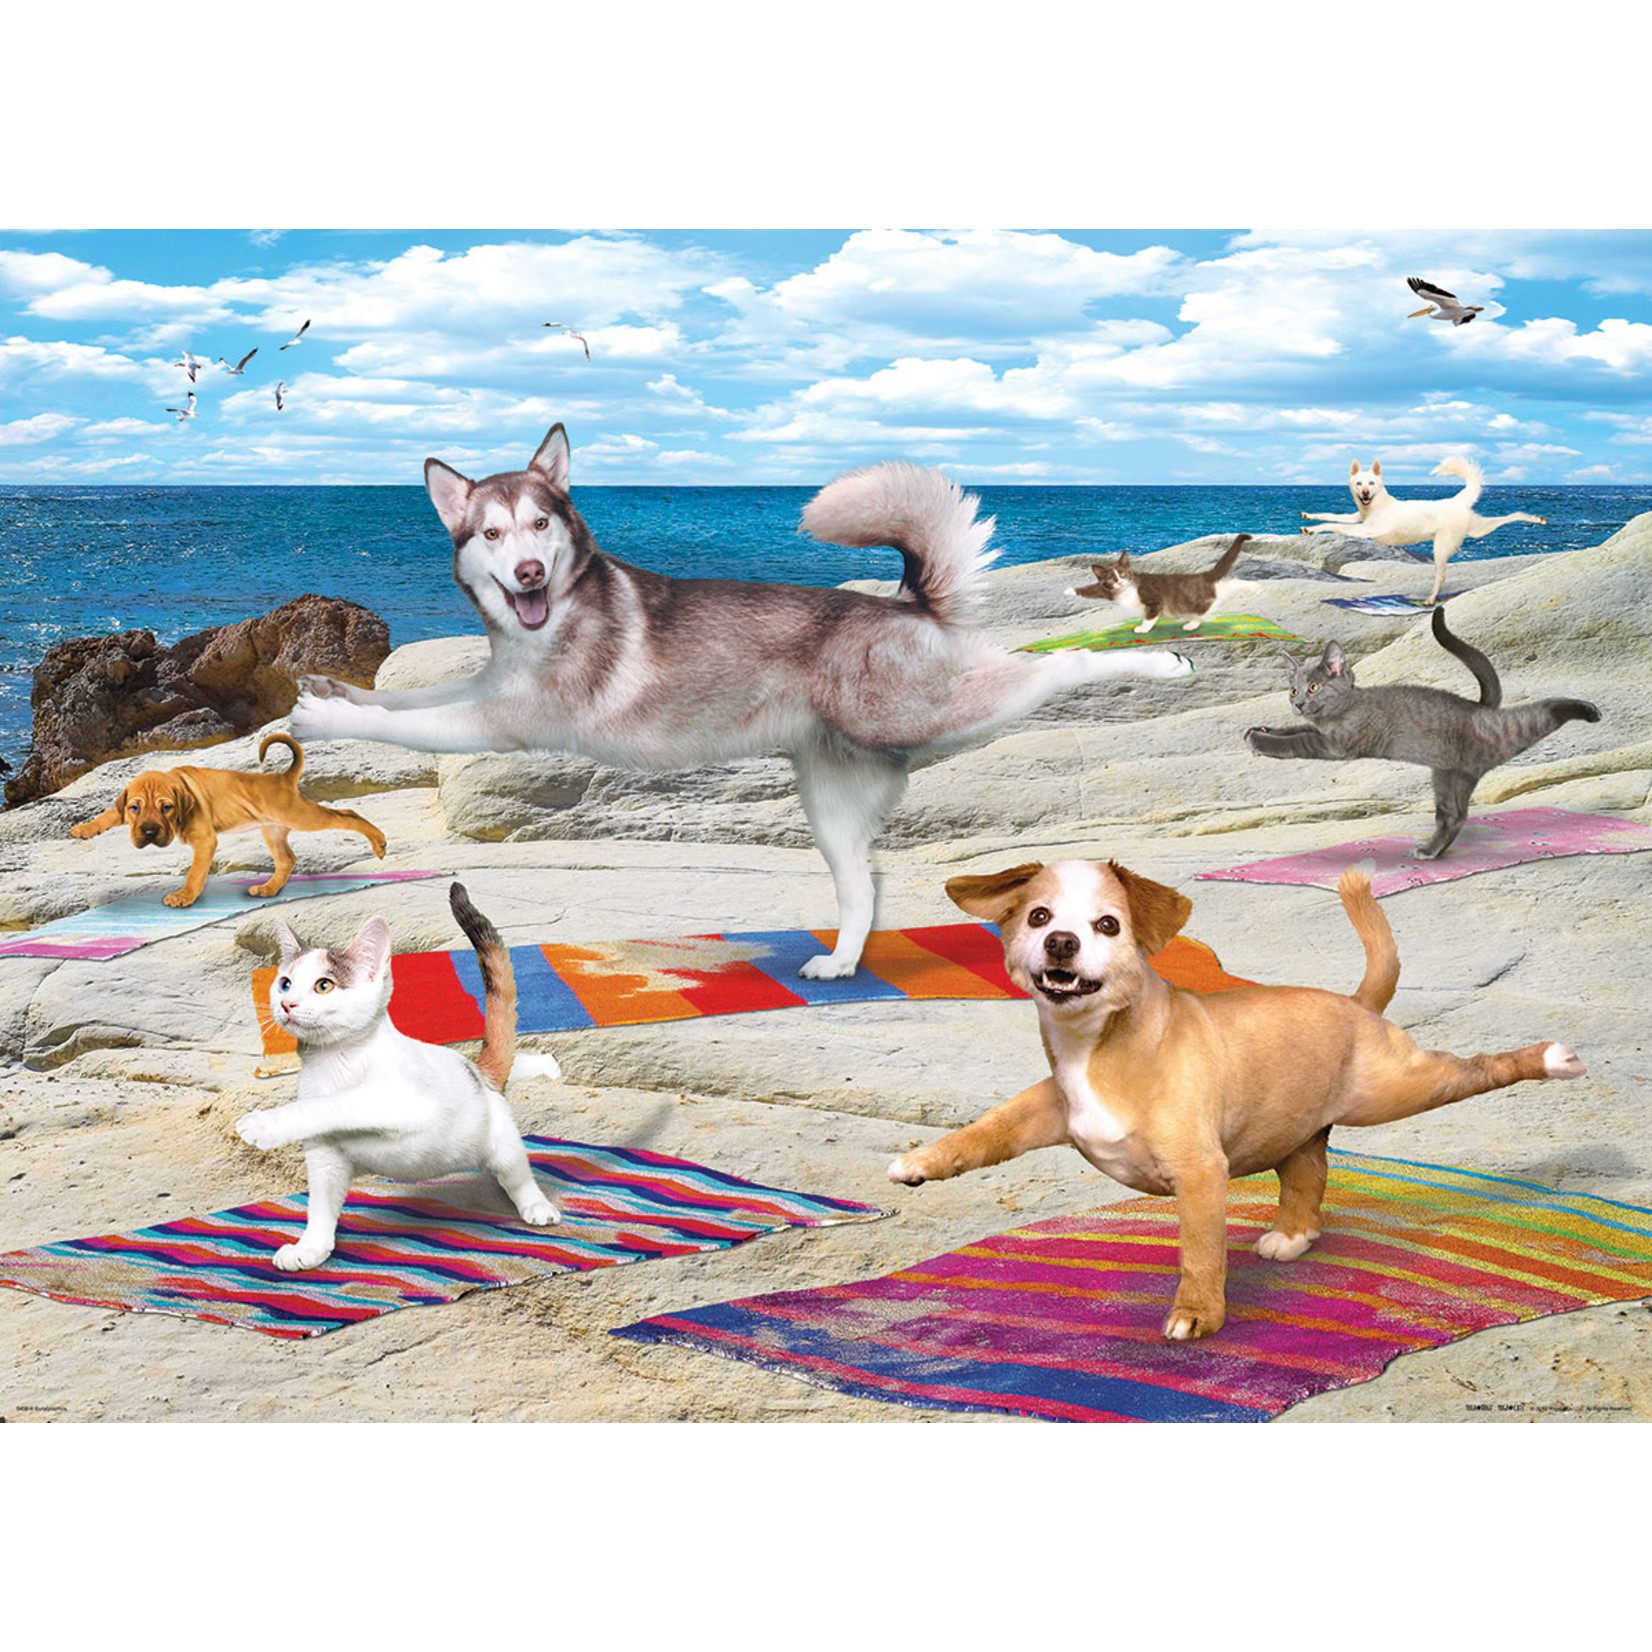 EuroGraphics Puzzles Yoga Beach 300pc